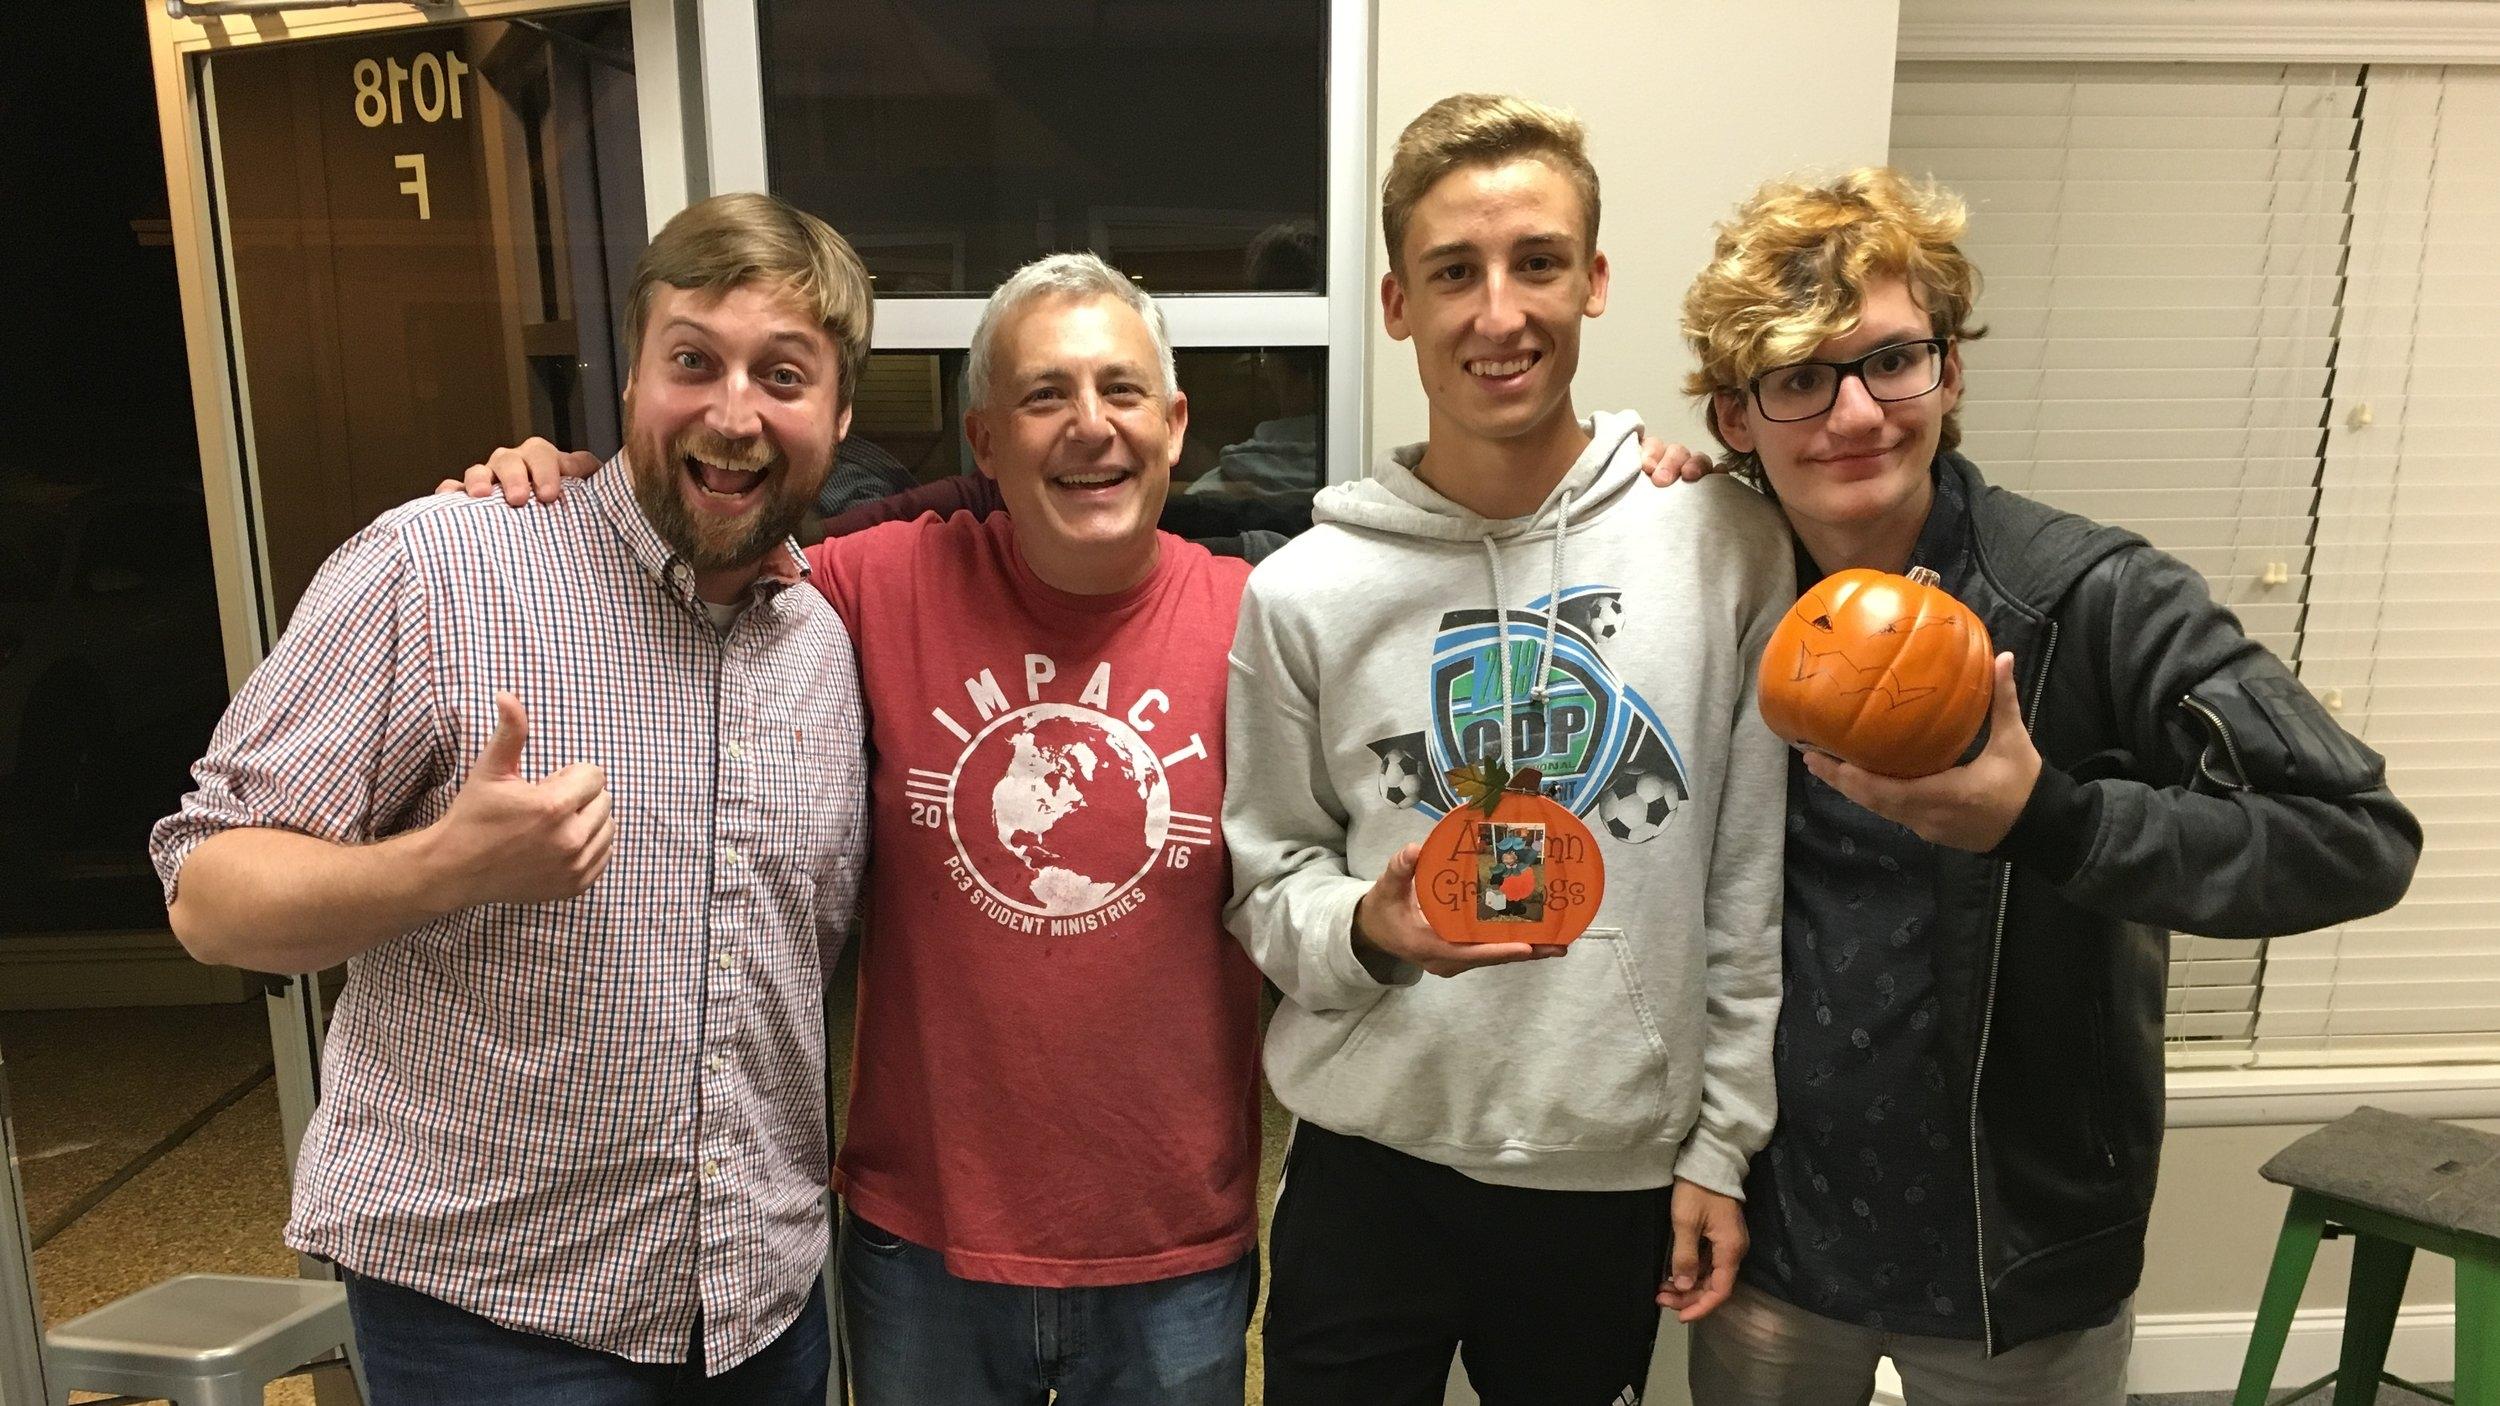 Senor Sharks - Congratulations to the Nate, Chris, Liam & Nicholas the 2018 Leland Pumpkin Hunt champions!